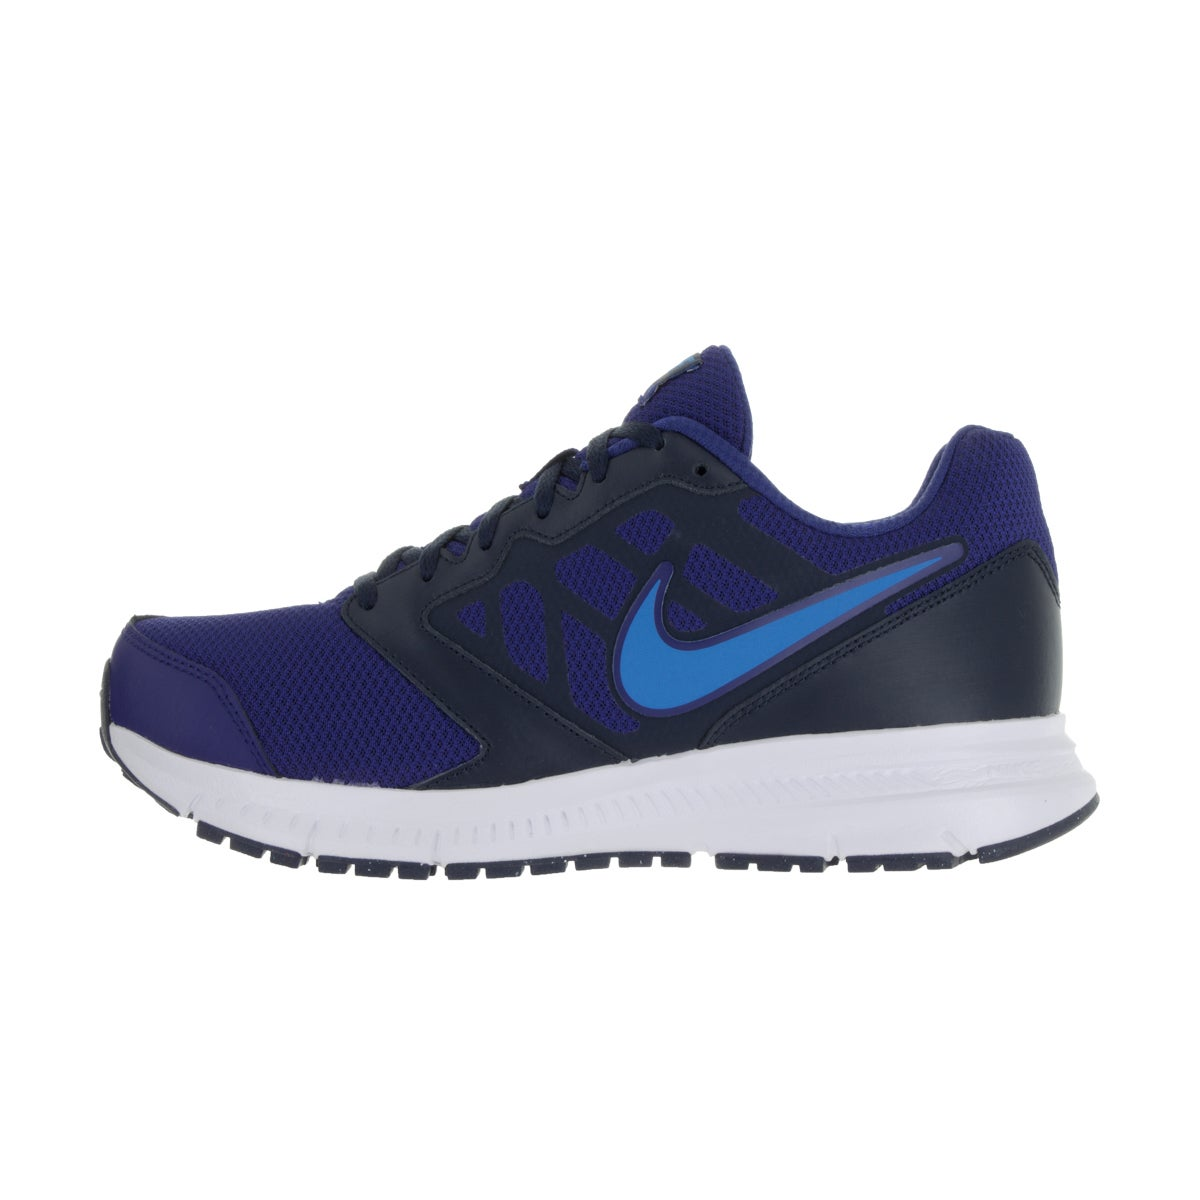 224283bf3ebc3 Shop Nike Men s Downshifter 6 Blue Fabric Running Shoes - Ships To Canada -  Overstock - 13404785